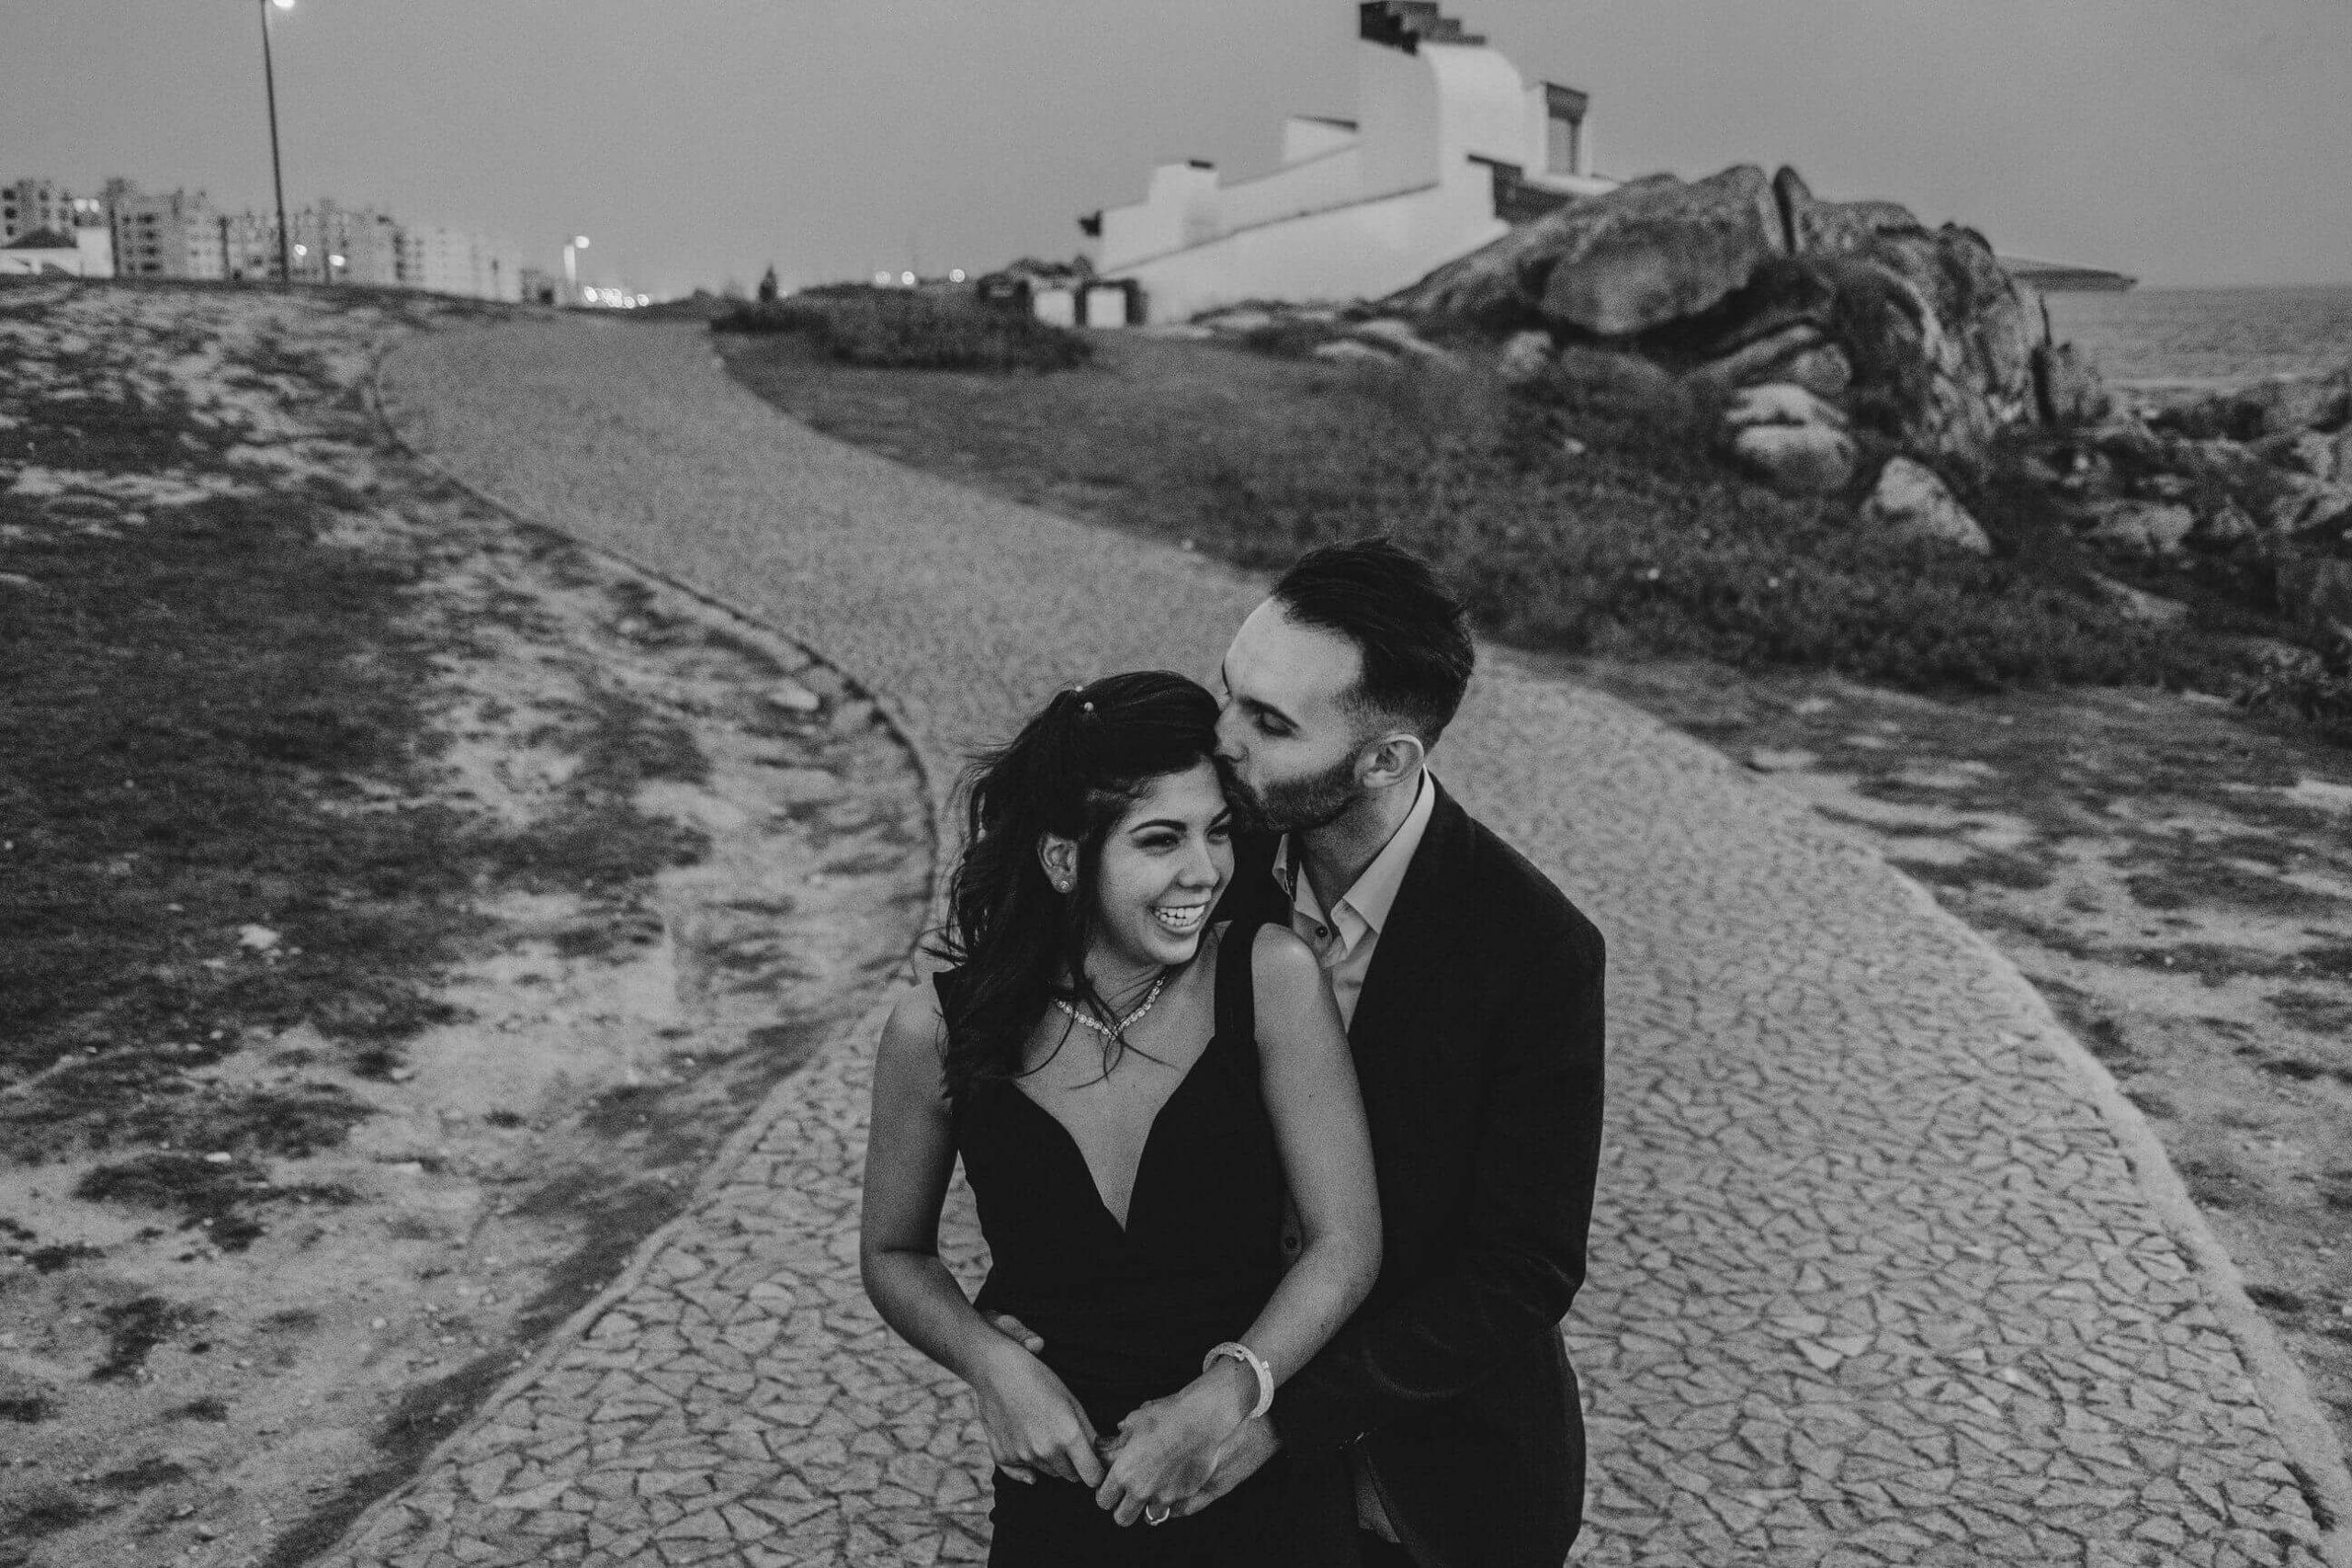 roma-organizacao-eventos-pedido-casamento-casa-de-cha-da-boa-nova-porto-portugal-23